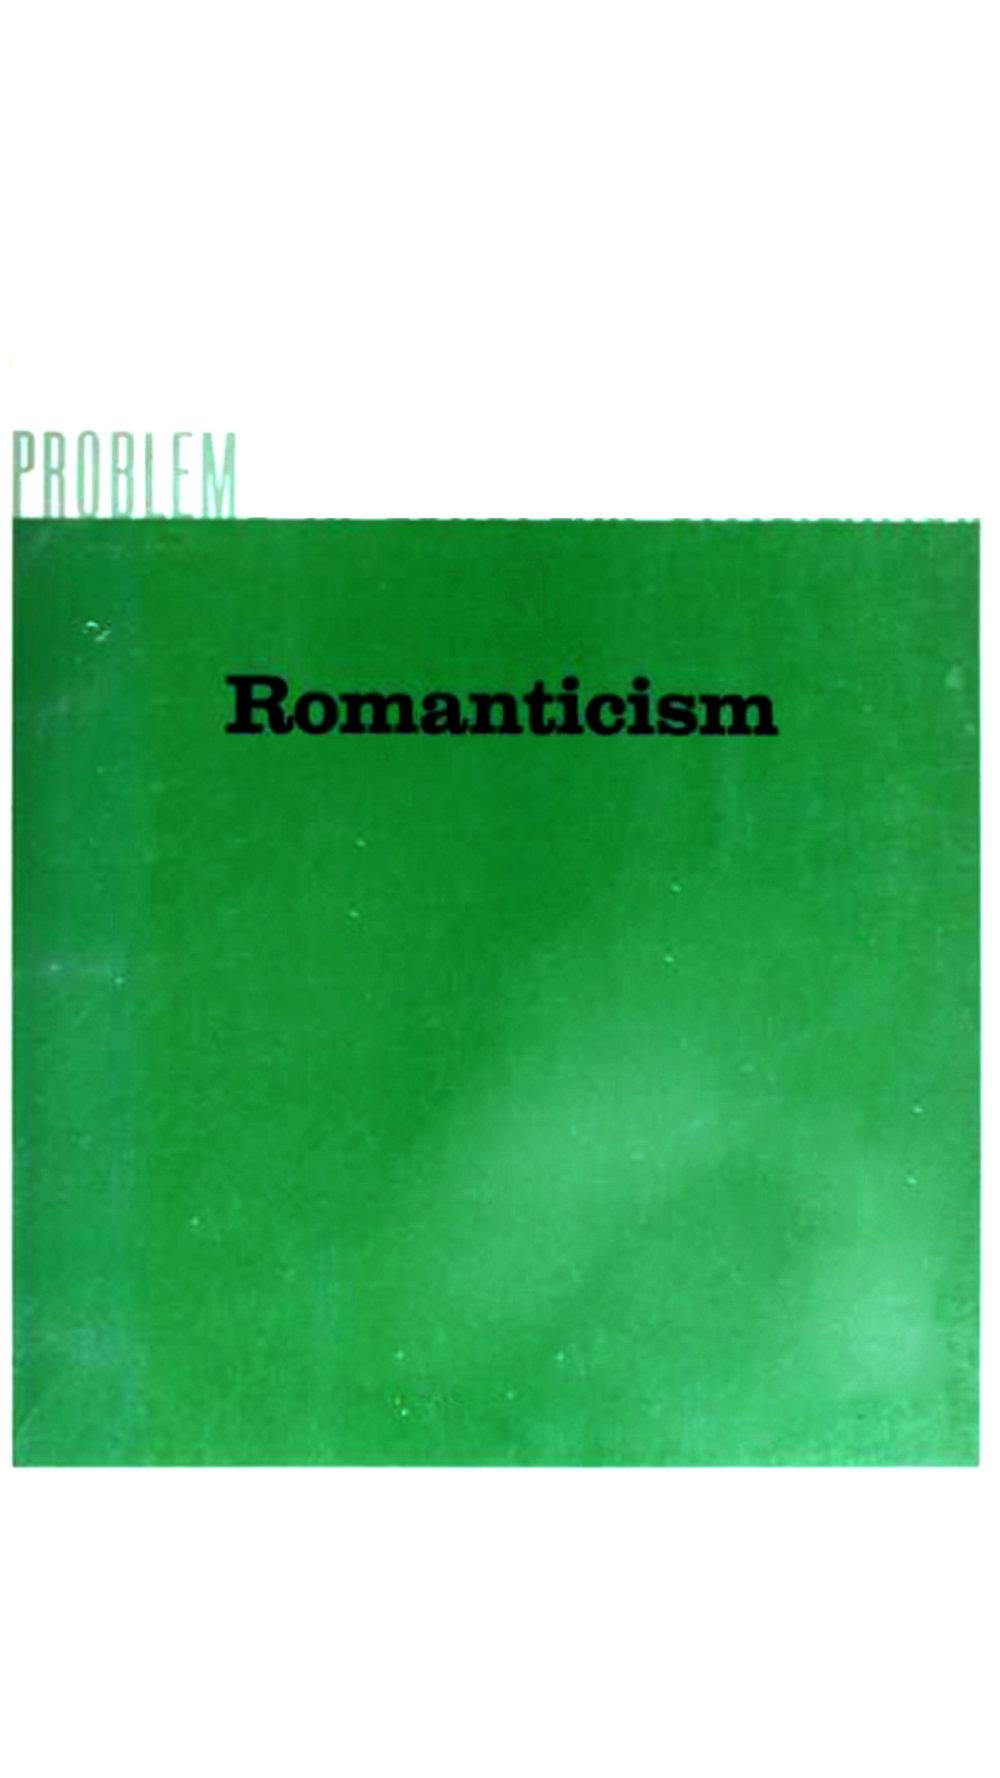 problemromanticism.jpg